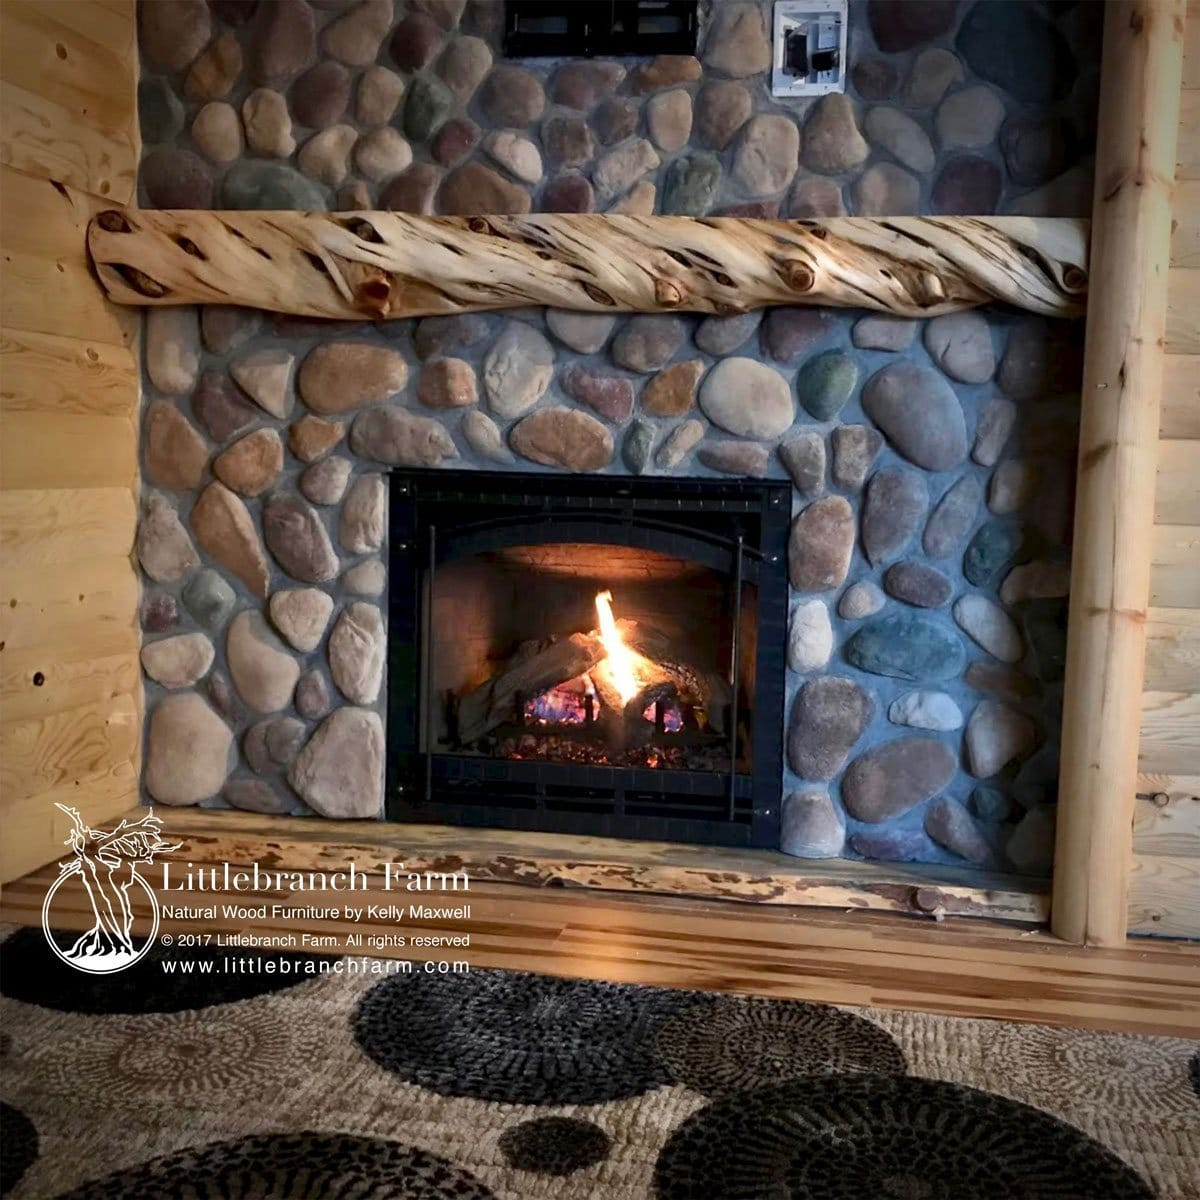 Log mantel on river stone fireplace.